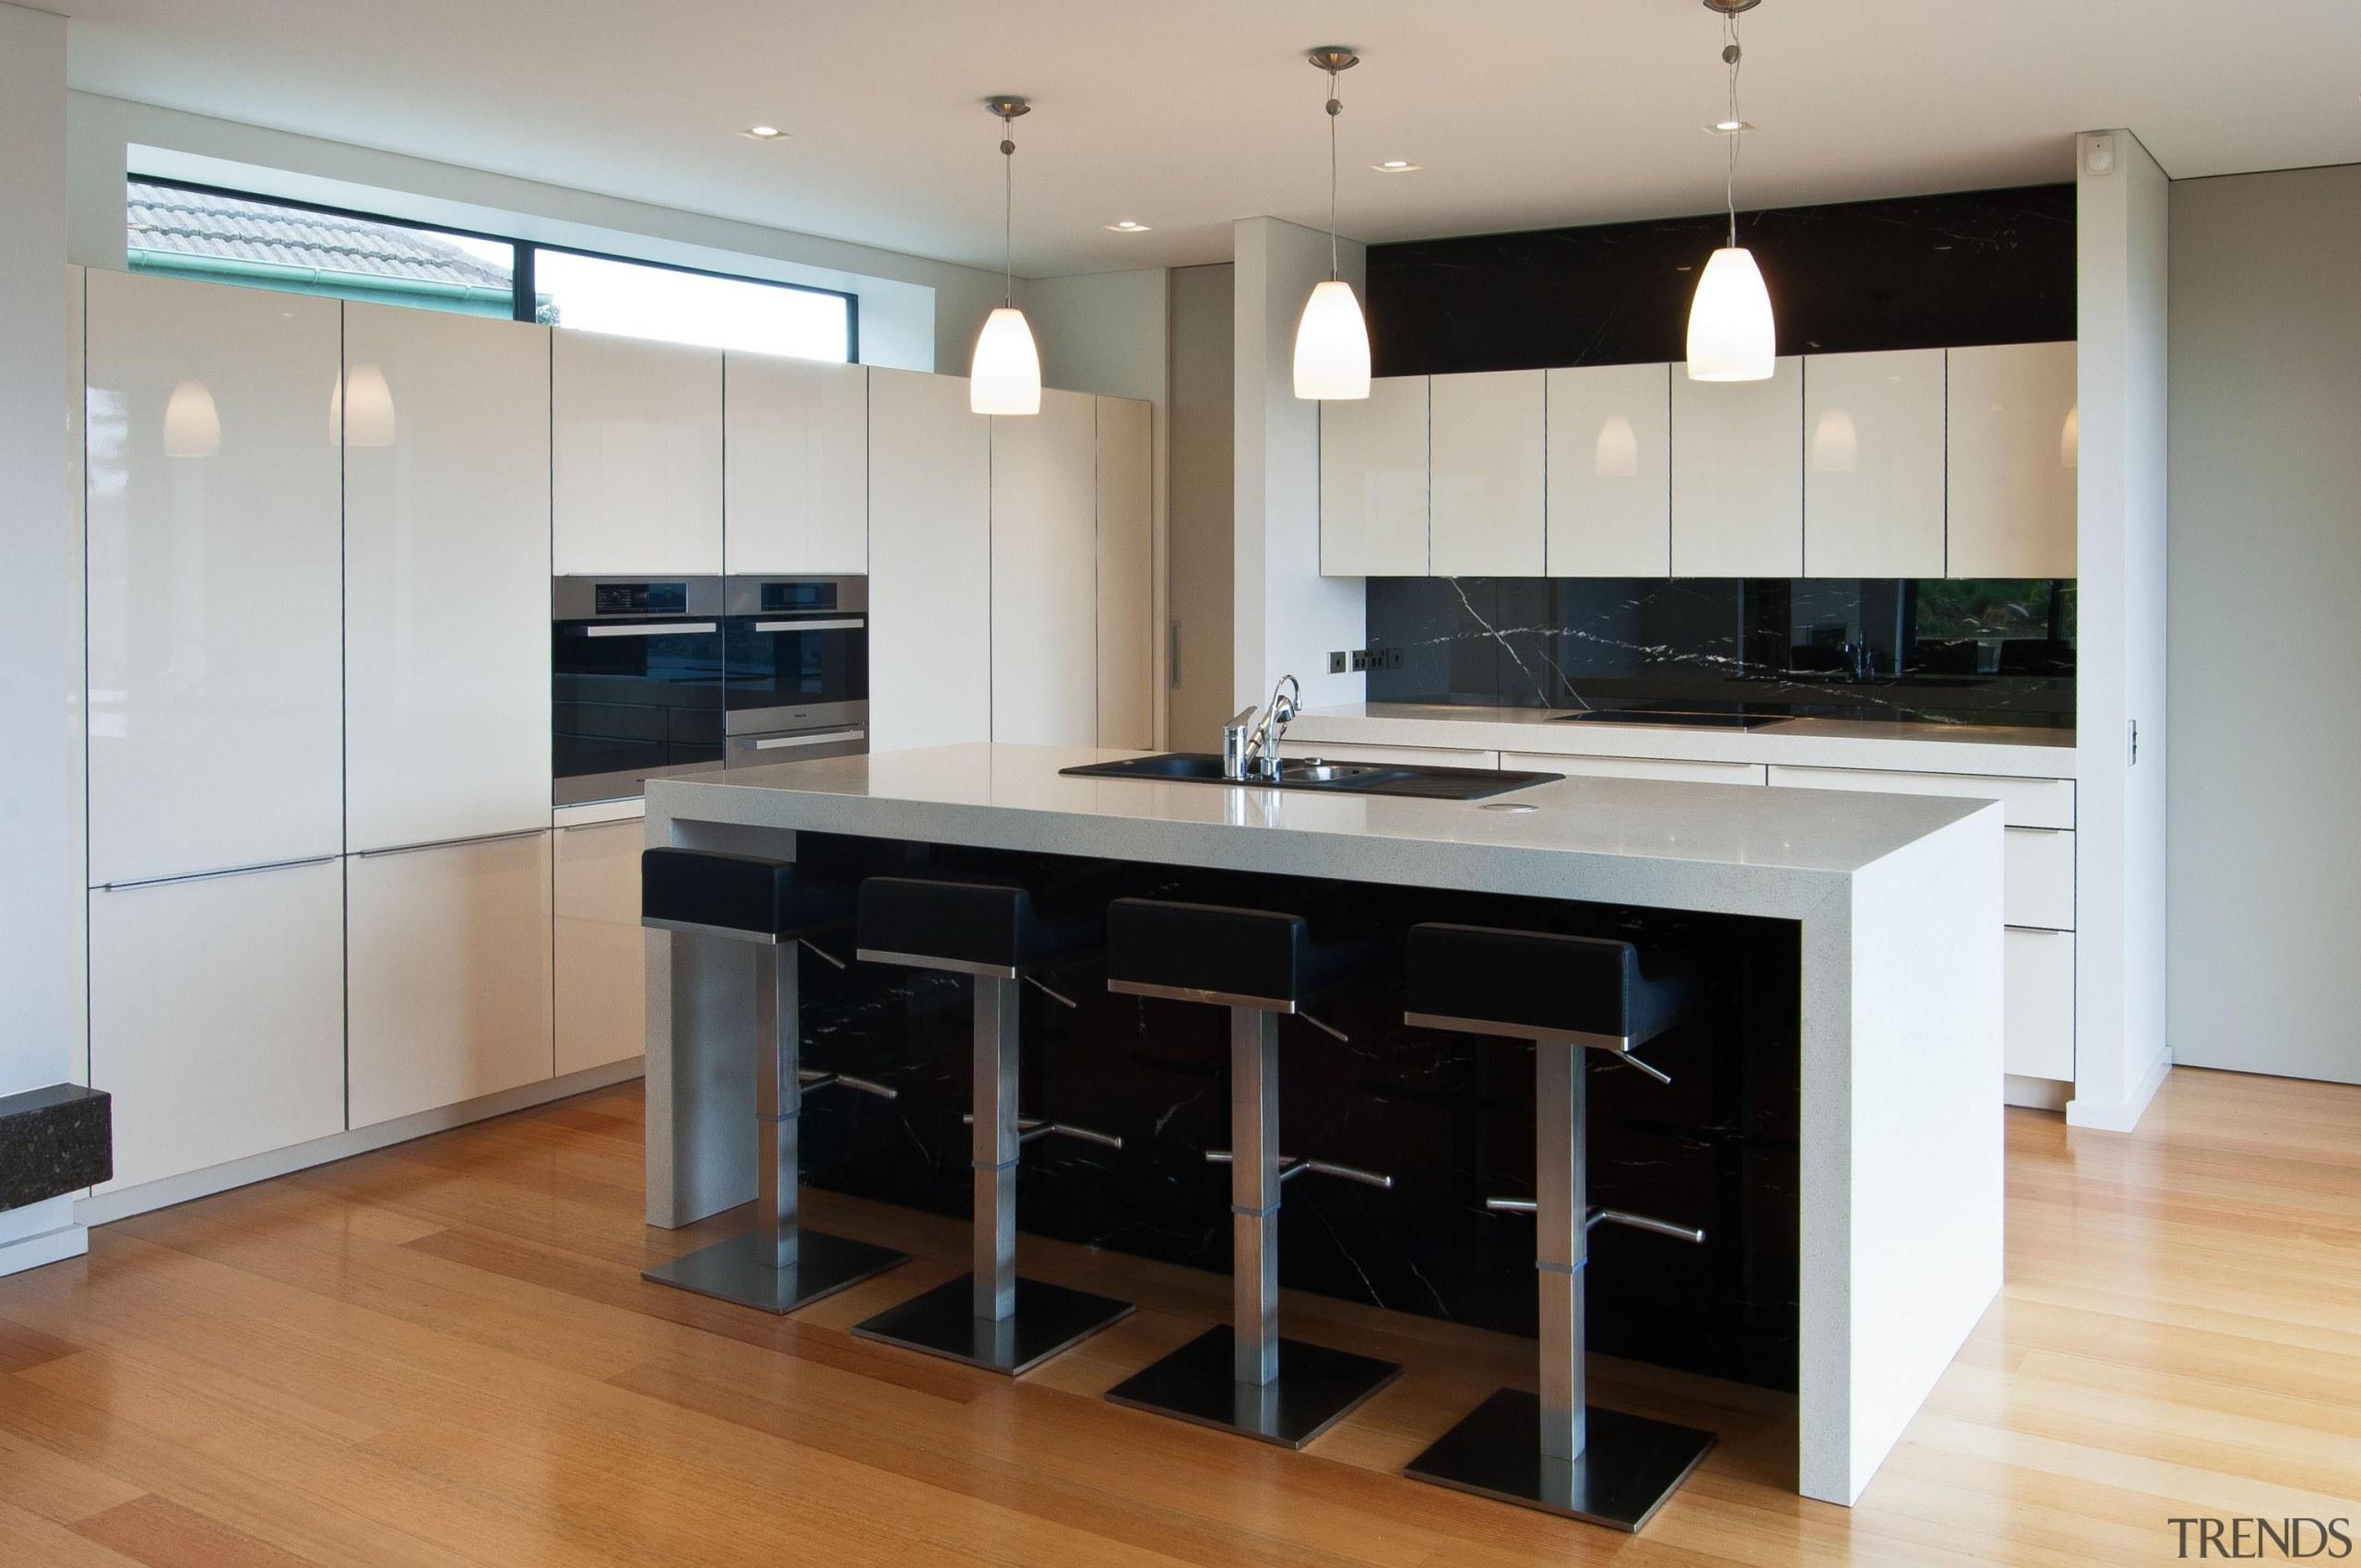 Khandallah Kitchen - Khandallah Kitchen - cabinetry | cabinetry, countertop, cuisine classique, floor, flooring, hardwood, interior design, kitchen, room, wood flooring, gray